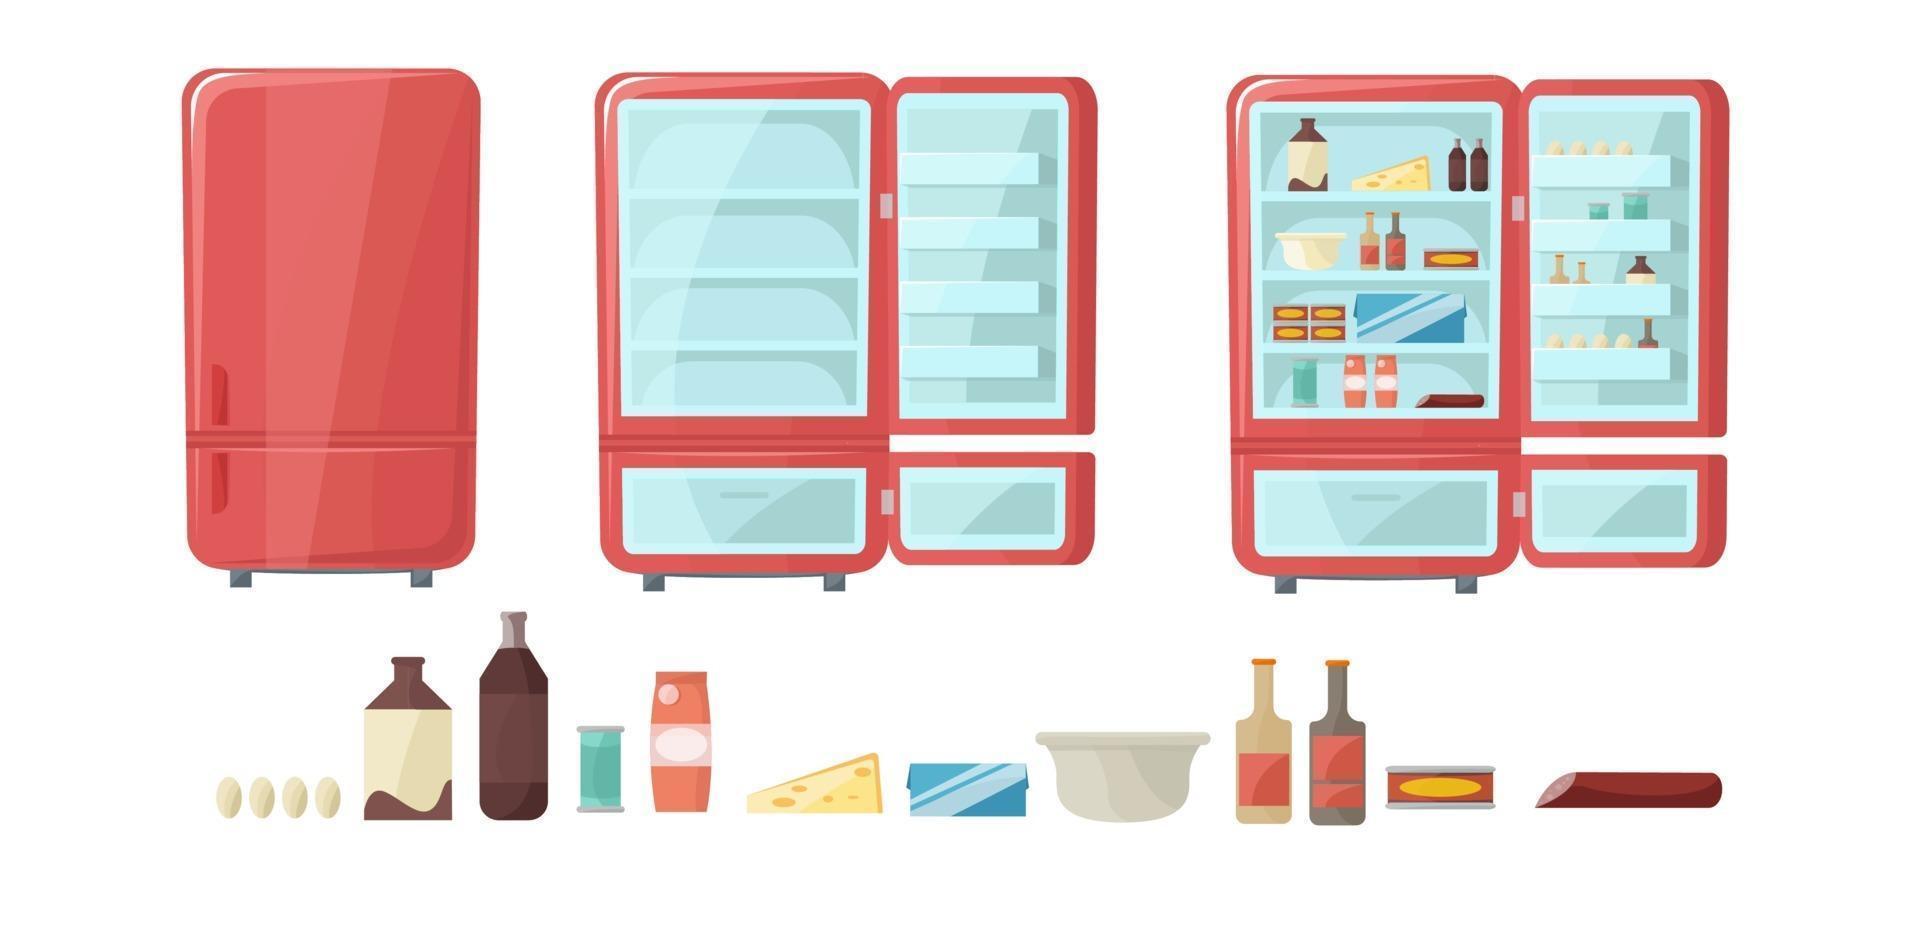 Kühlschrank voller Lebensmittel. leeres und geschlossenes Kühlschrankset. Kühler öffnen. Vektorillustration im Cartoon-Stil. vektor